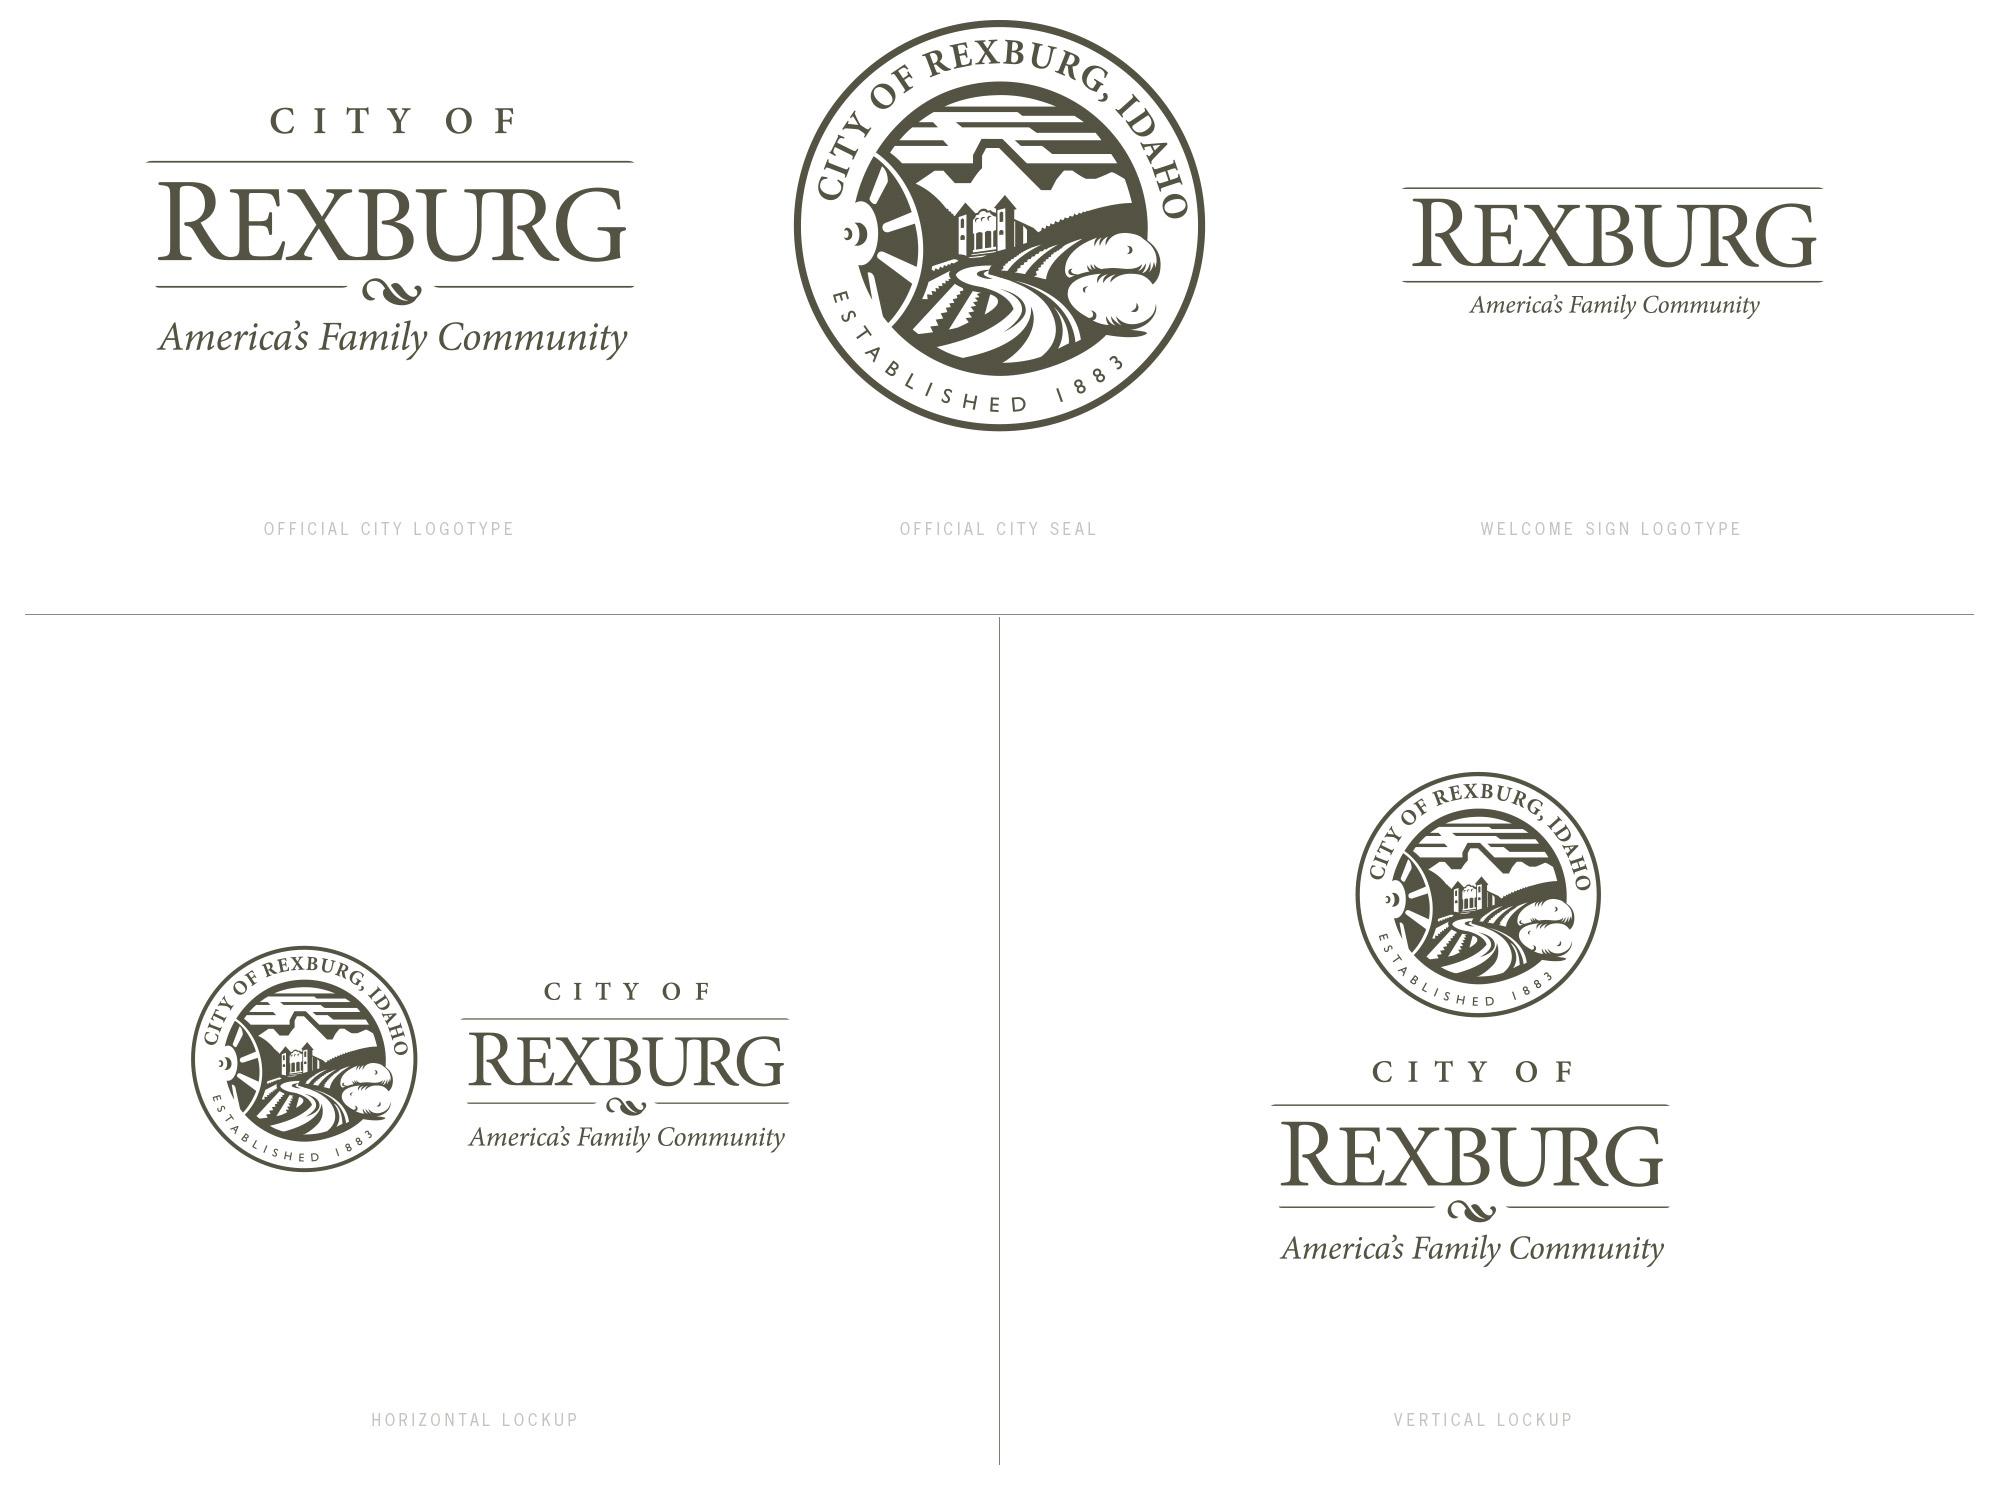 rexburg-city-logo-variations.jpg